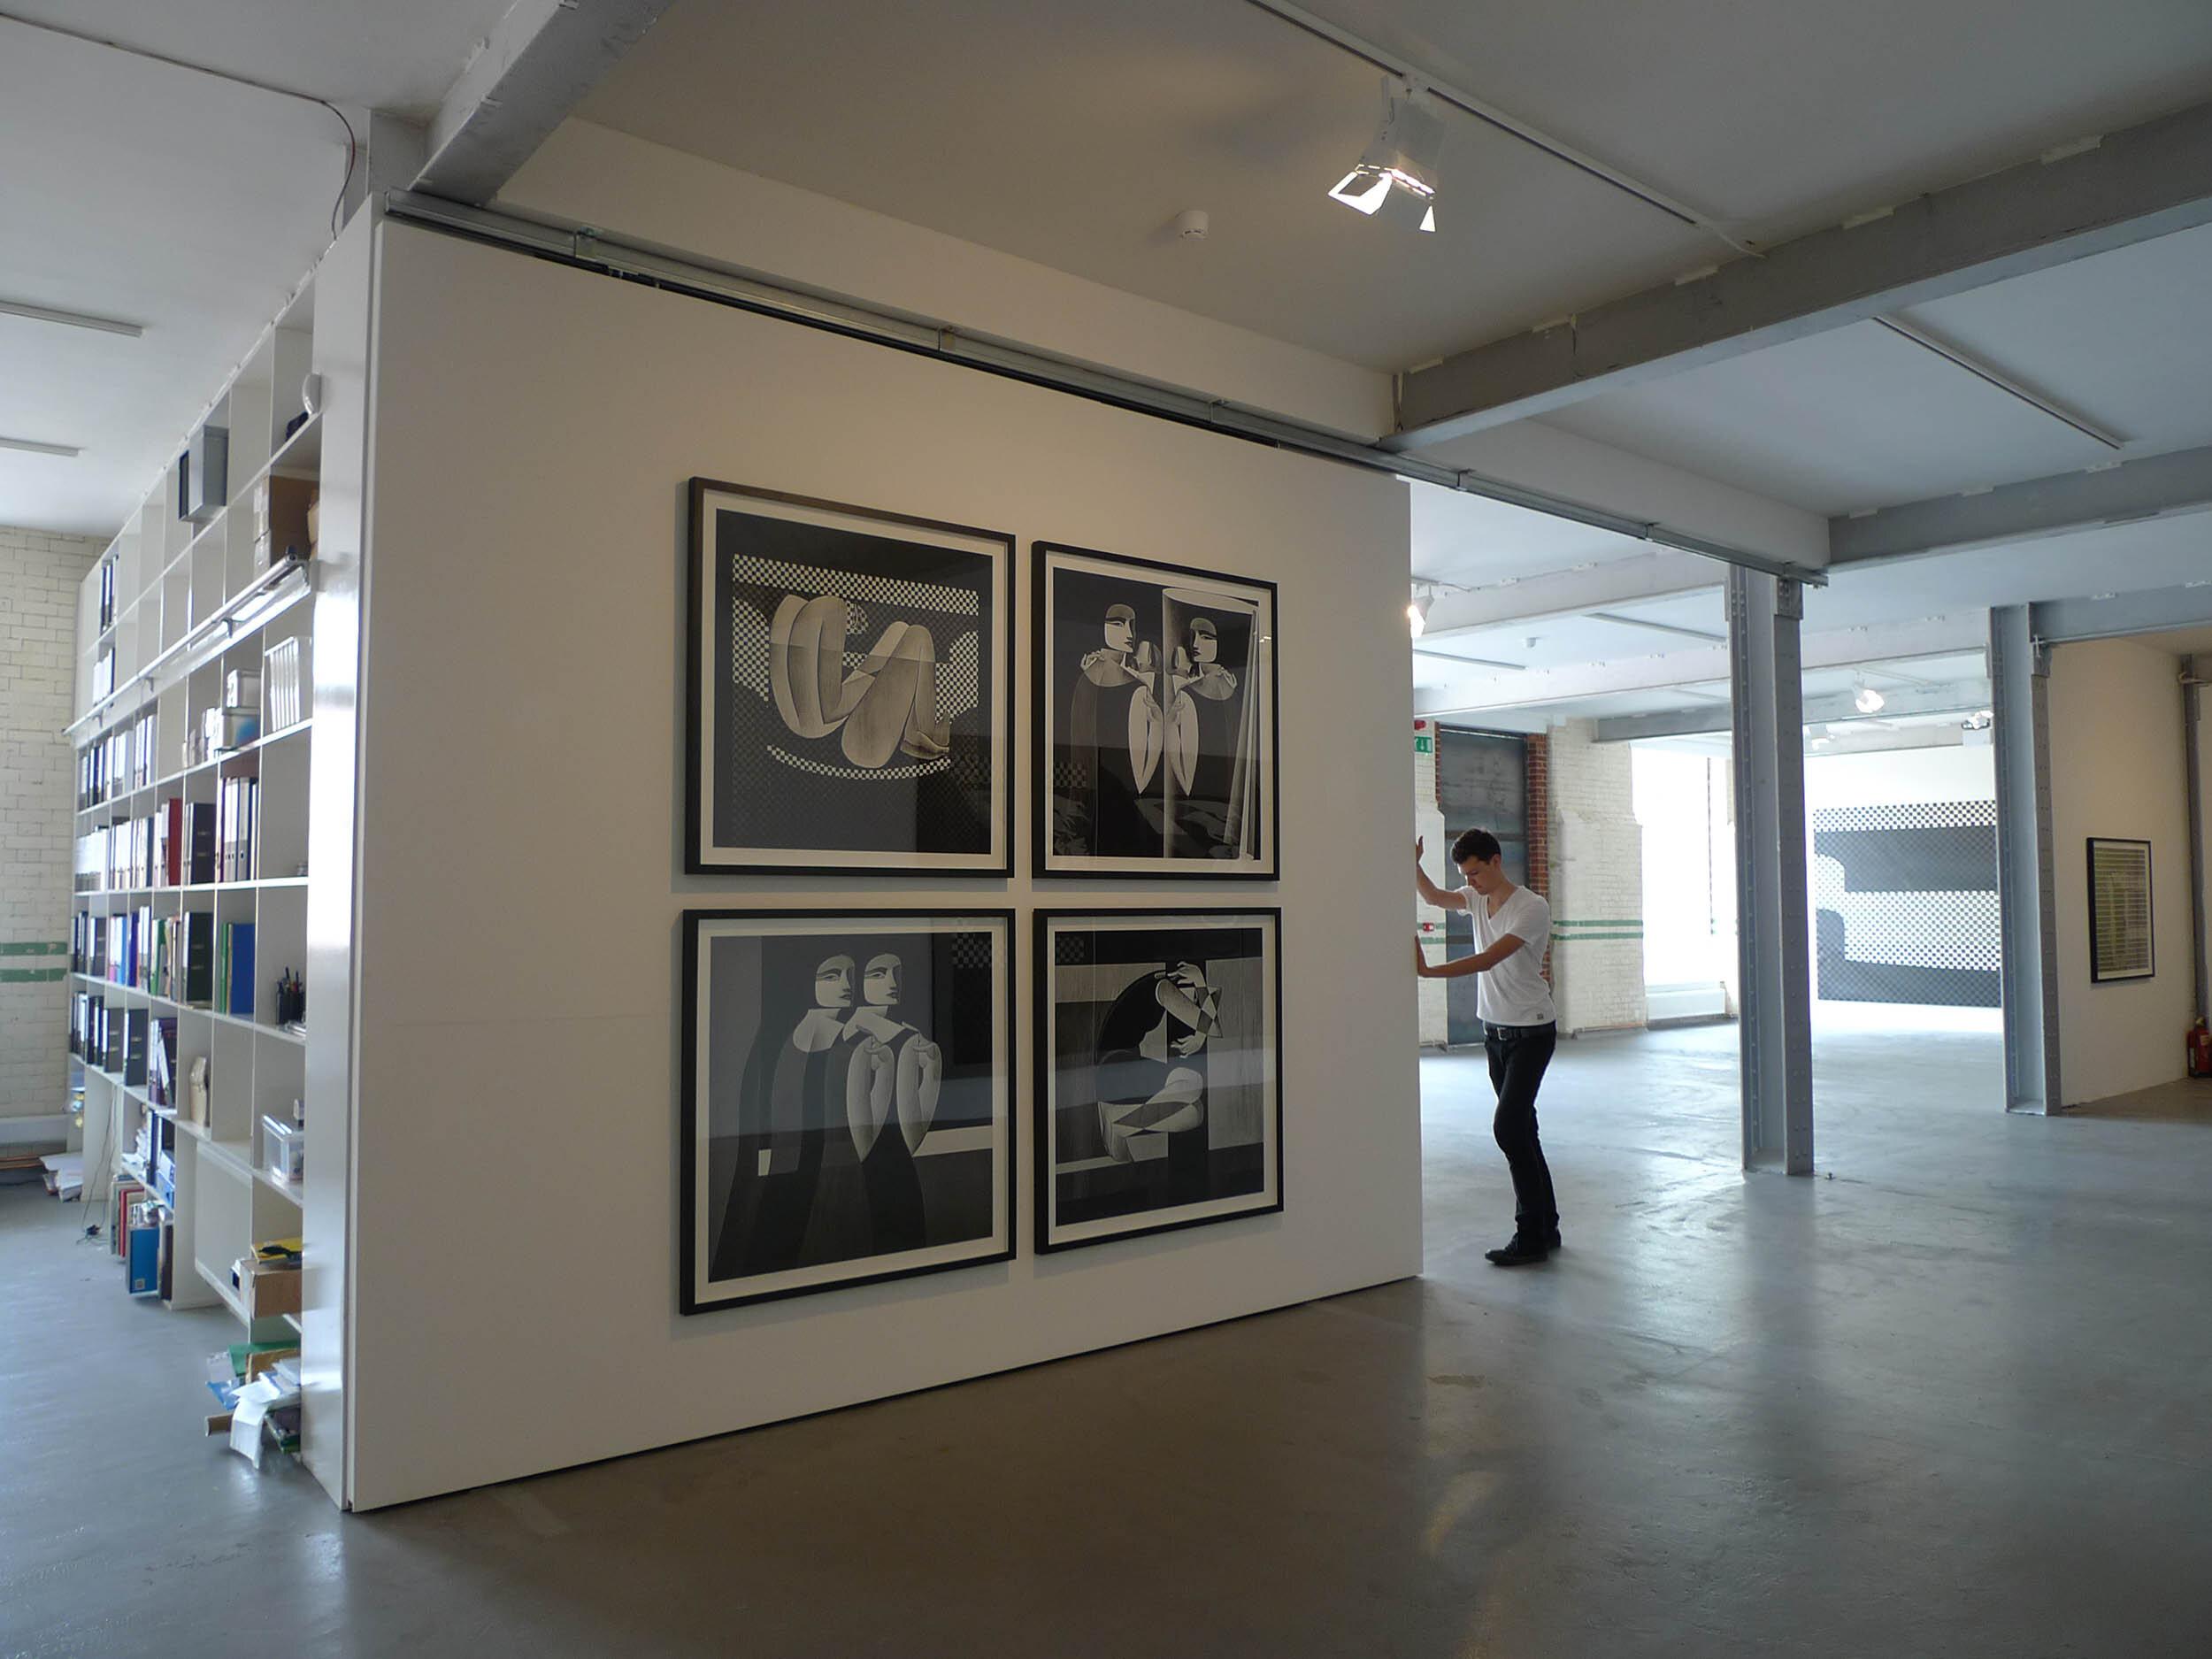 Edge of Arabia Gallery @ Testbed 1 London aLL Design (6).JPG